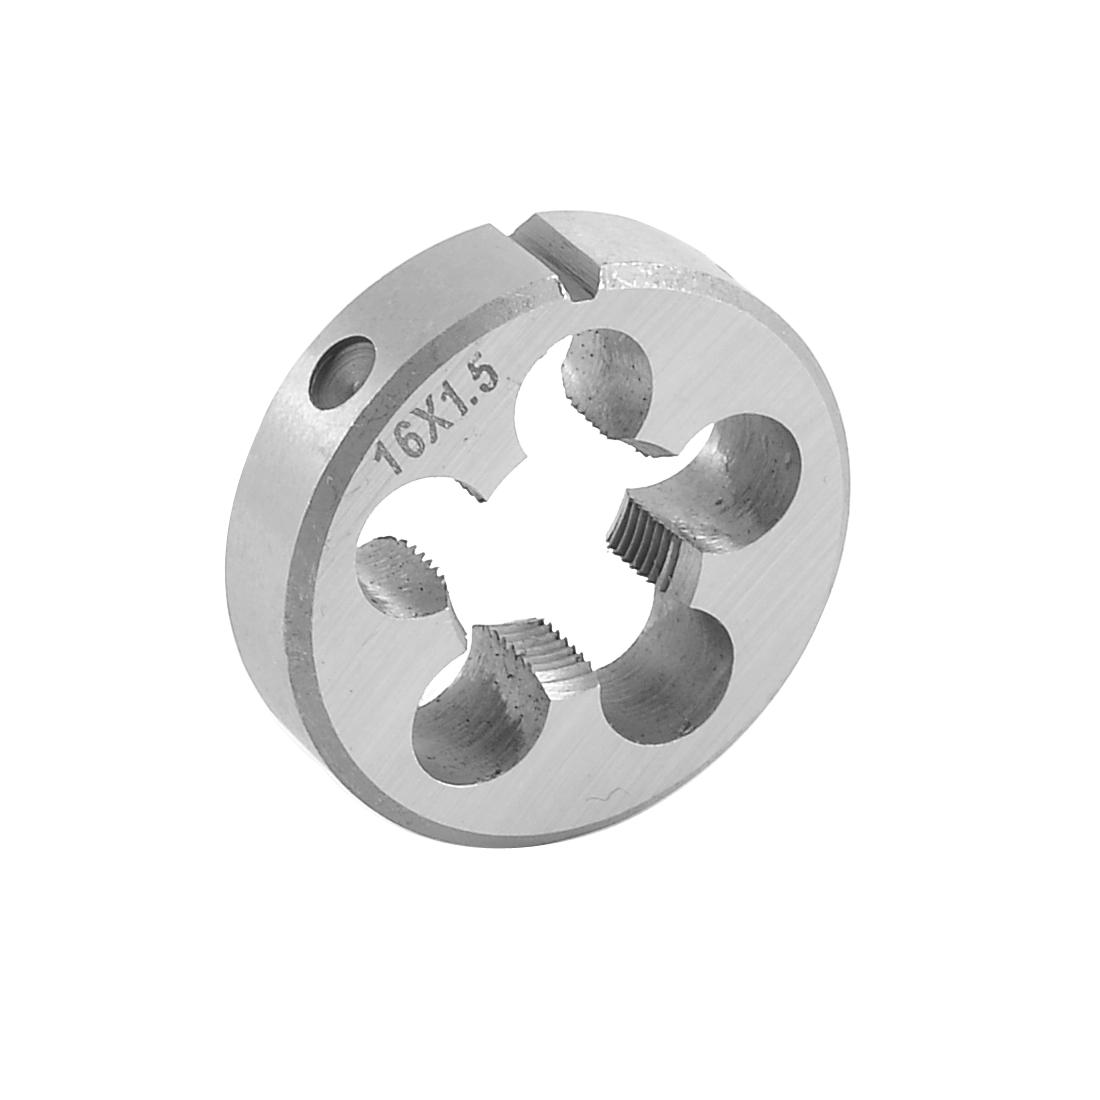 Steel 10mm Thickness Metric M16 x 1.5mm Screw Thread Round Die Tool